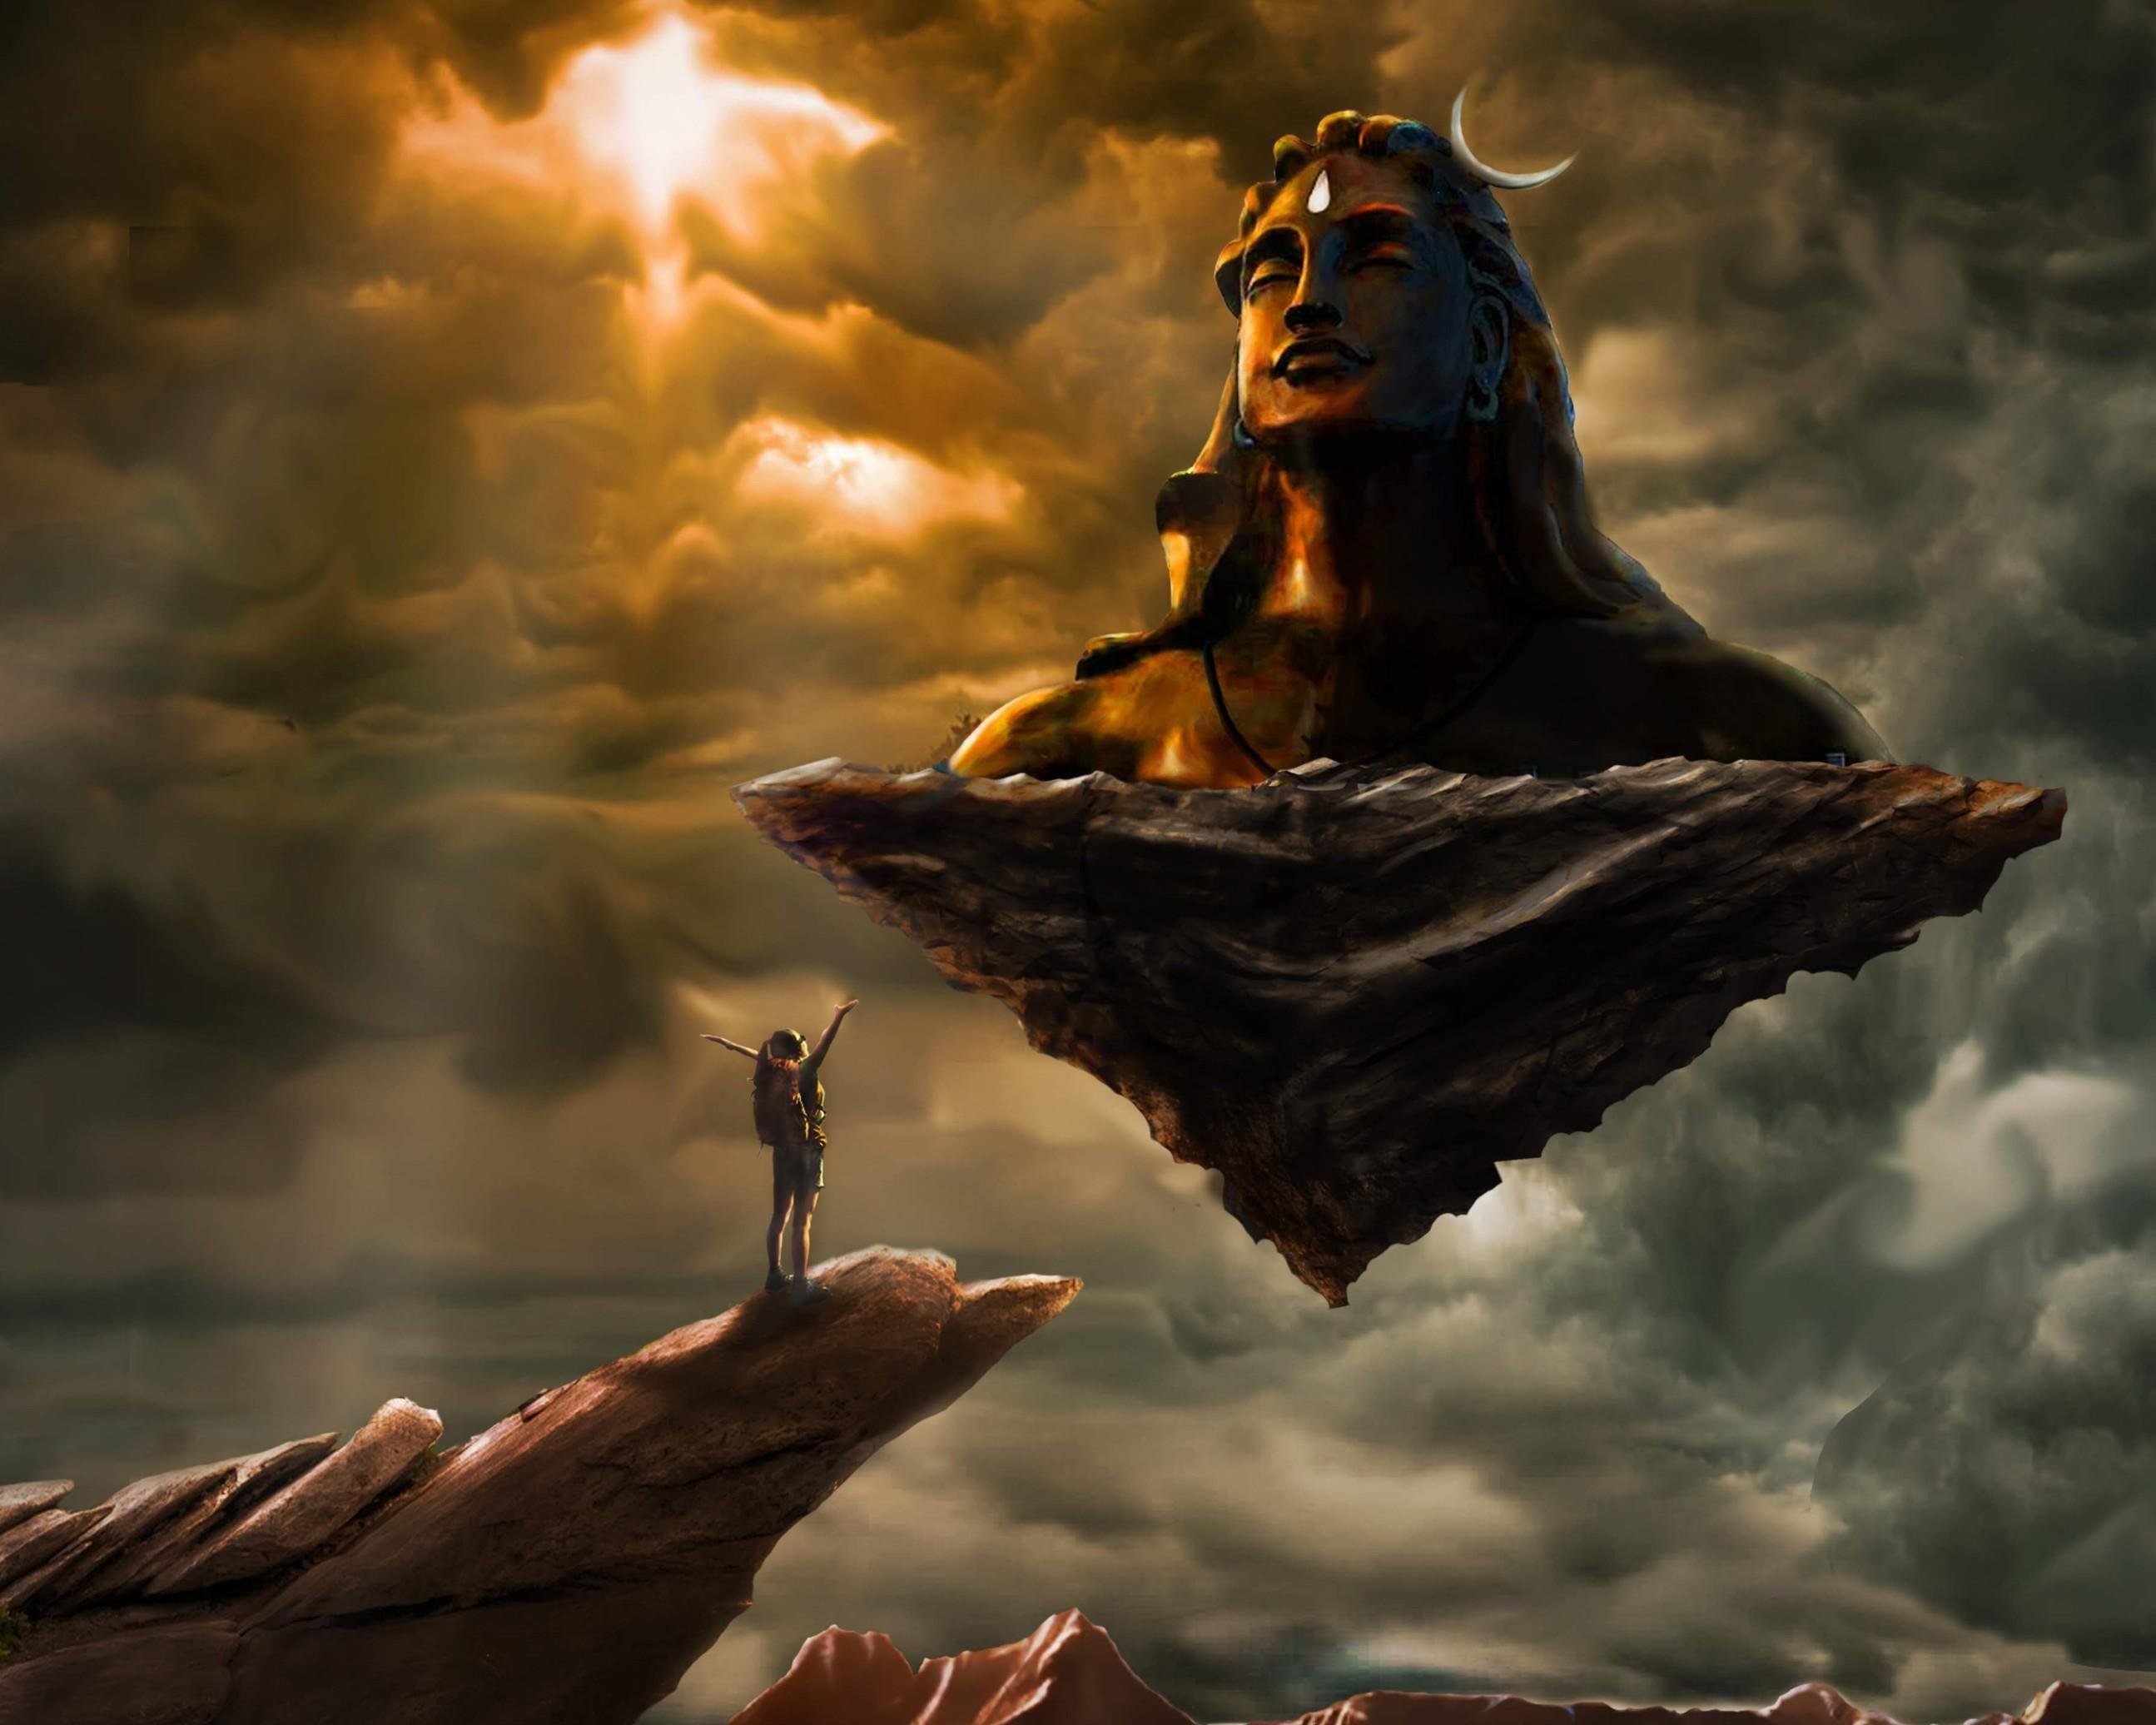 Shiva 1280x1024 Lord Shiva Hd Images Lord Shiva Hd Wallpaper Lord Shiva Lord shiva hd wallpaper 1080p for pc